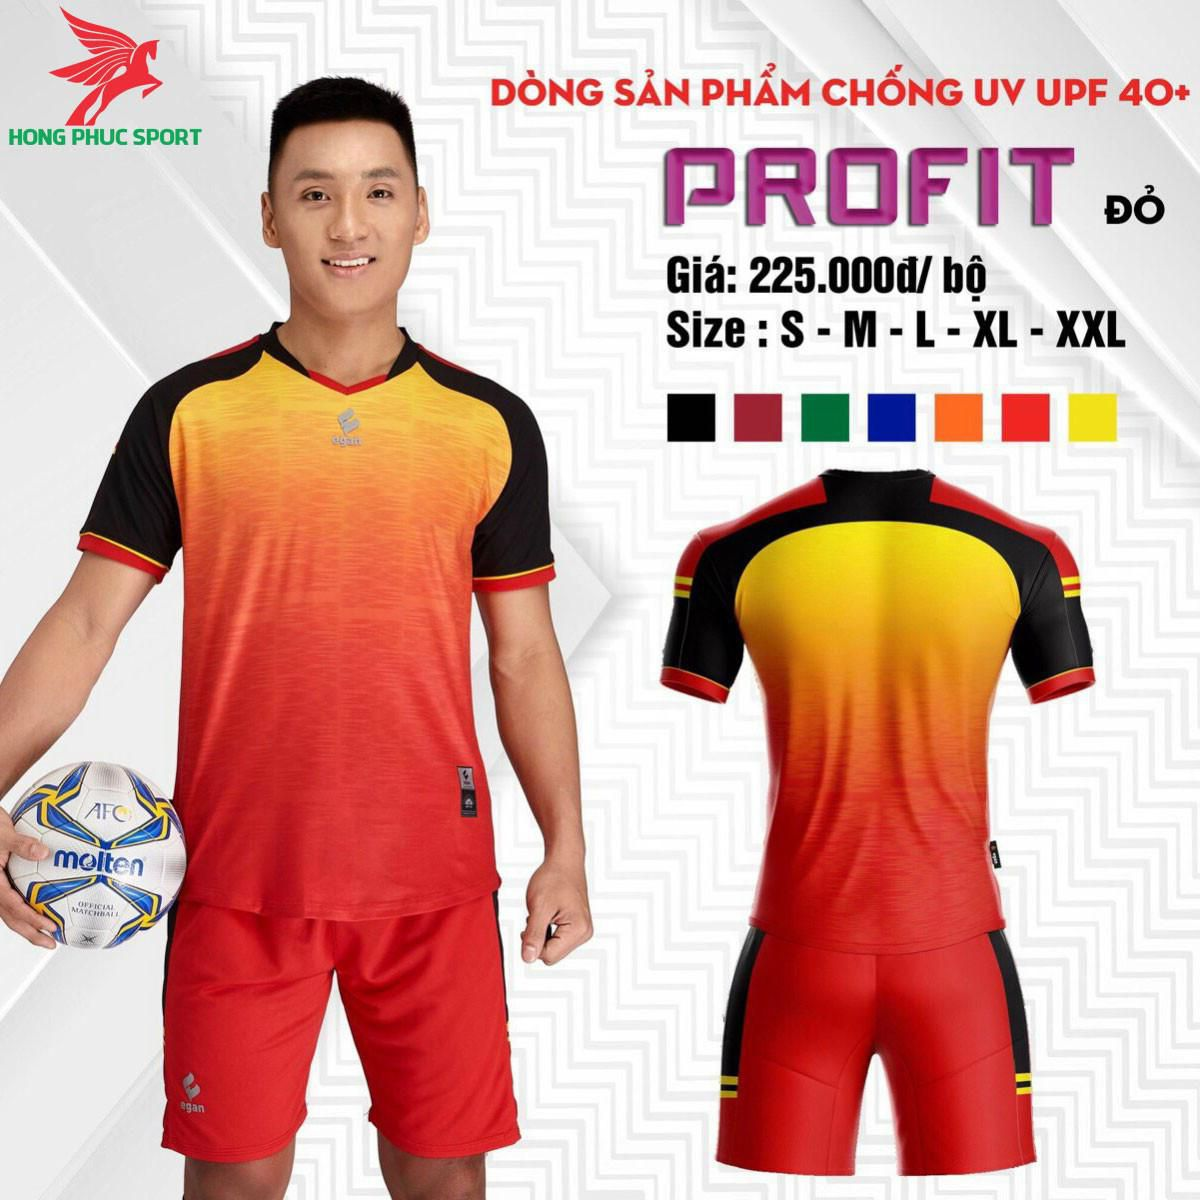 https://cdn.hongphucsport.com/unsafe/s4.shopbay.vn/files/285/ao-da-bong-khong-logo-egan-profit-mau-do-605065c57a3a2.jpg